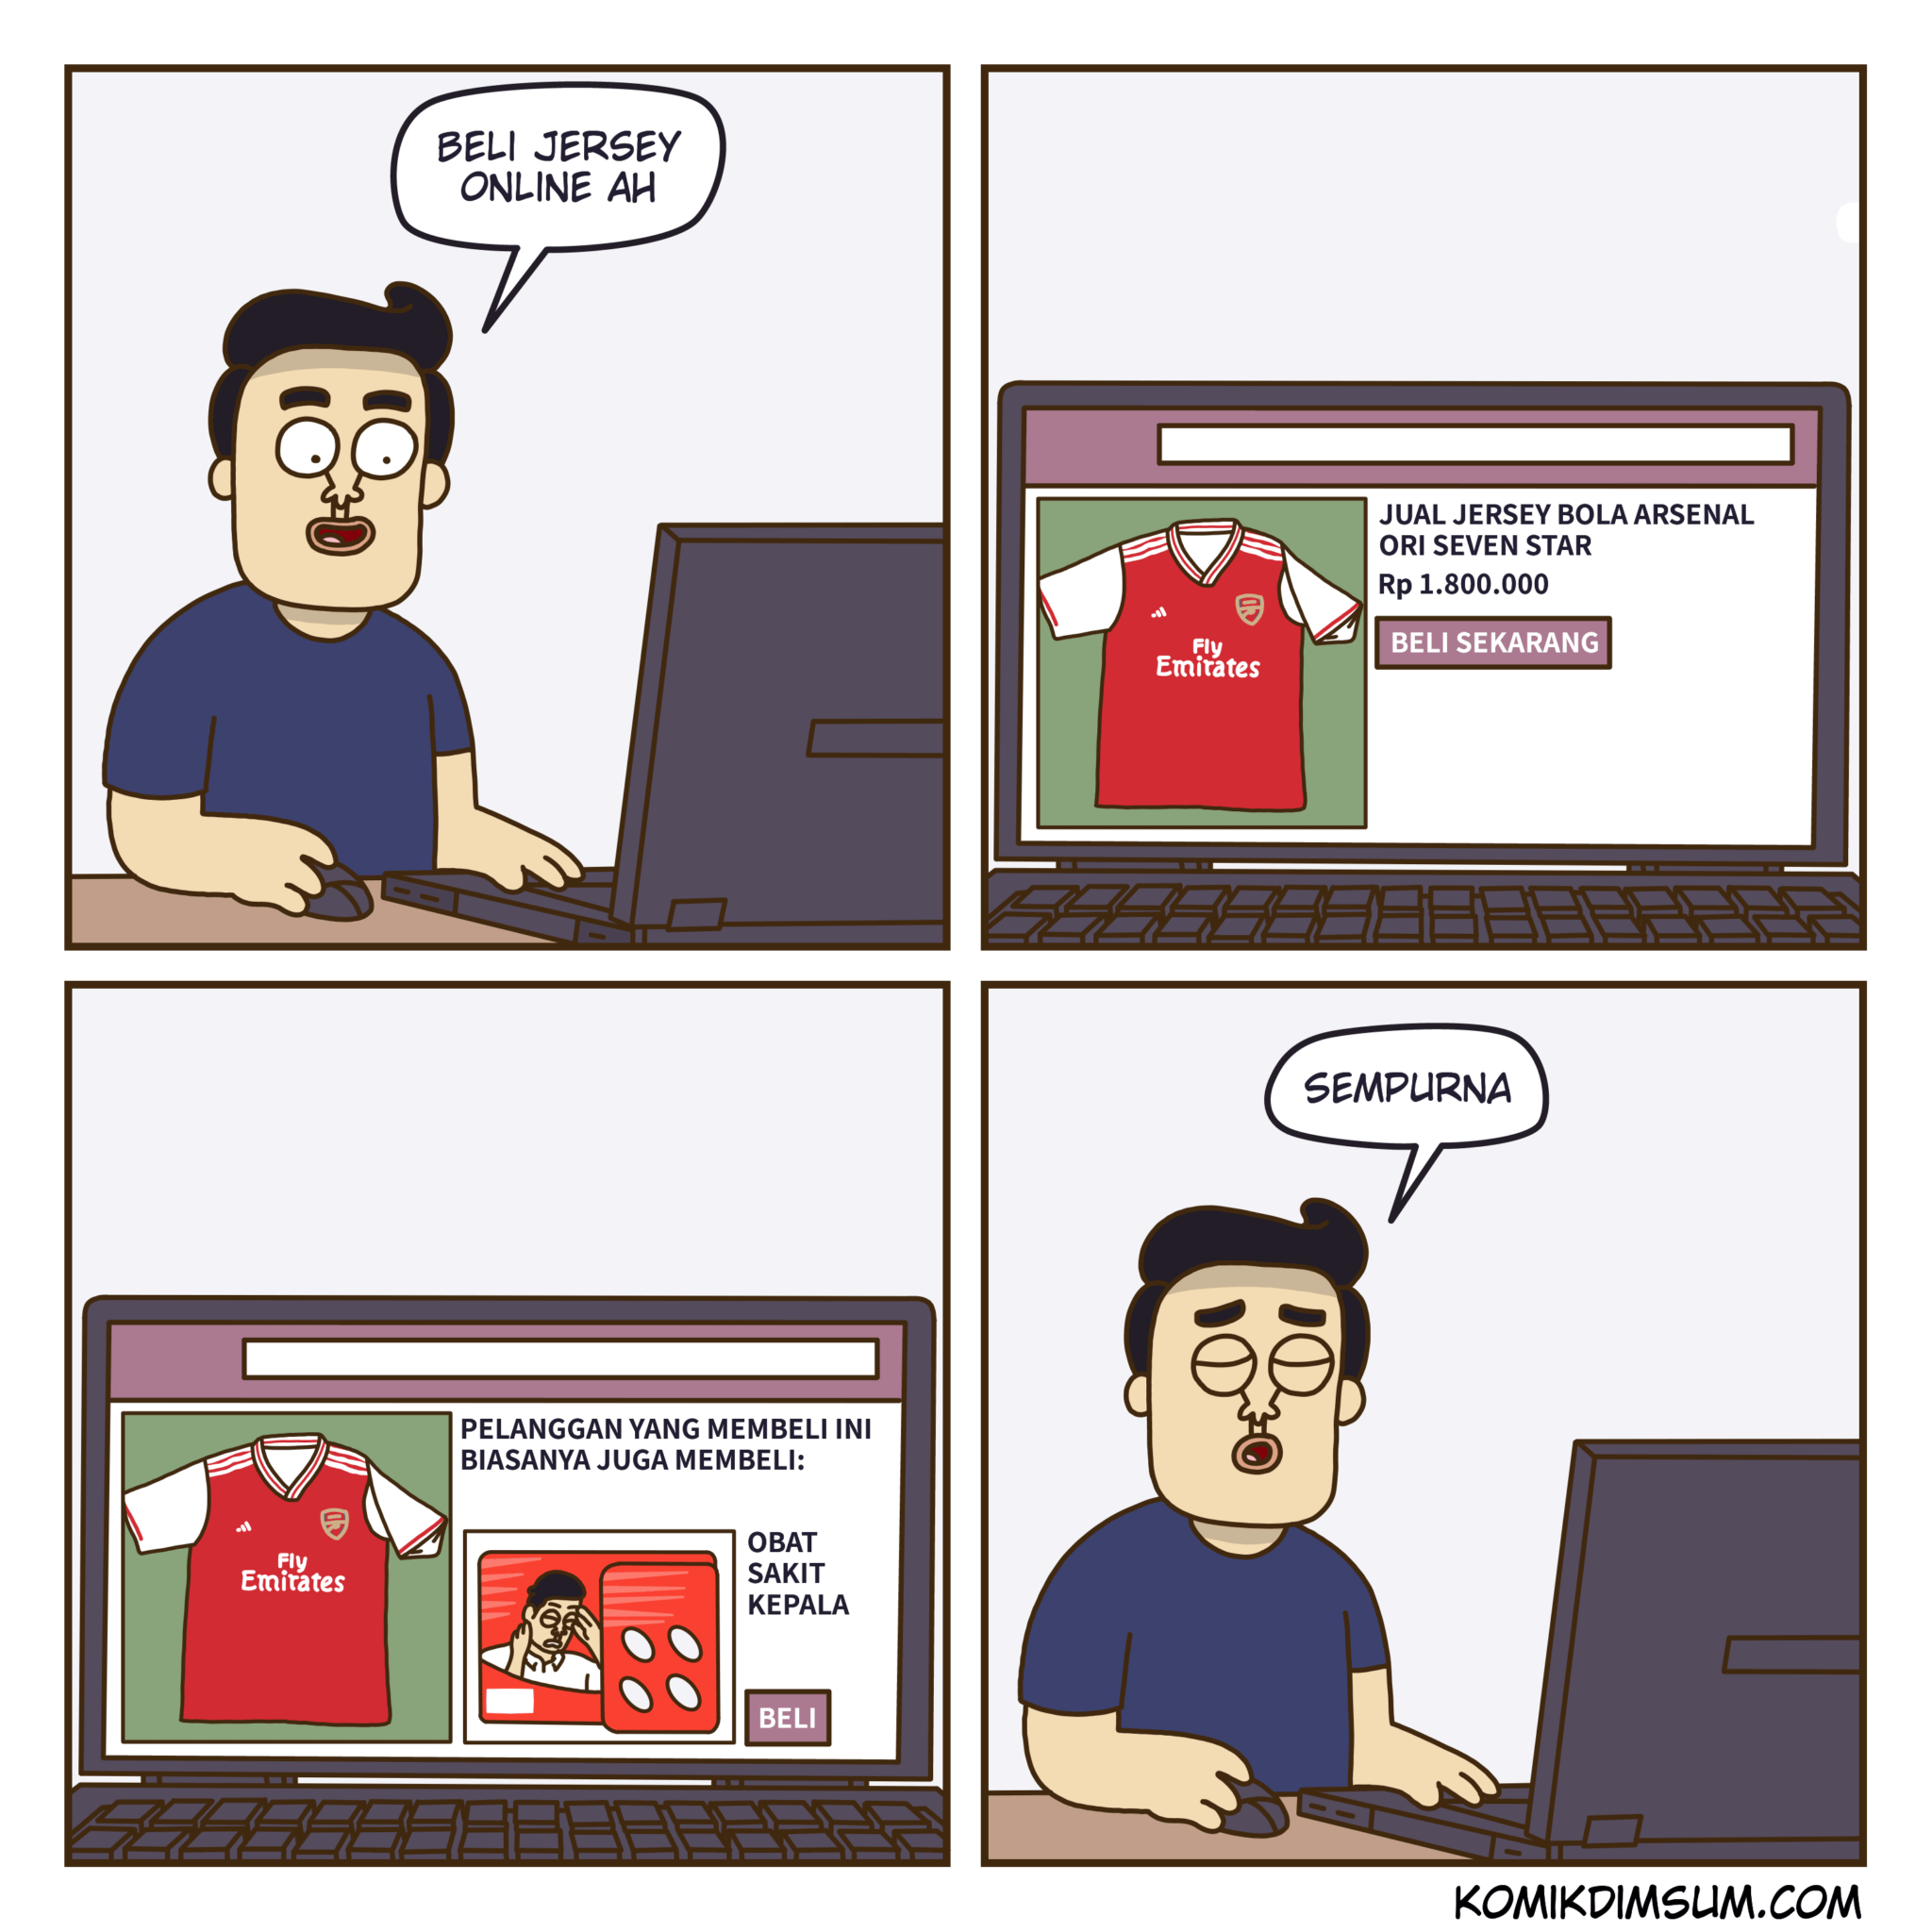 Beli Jersey Online